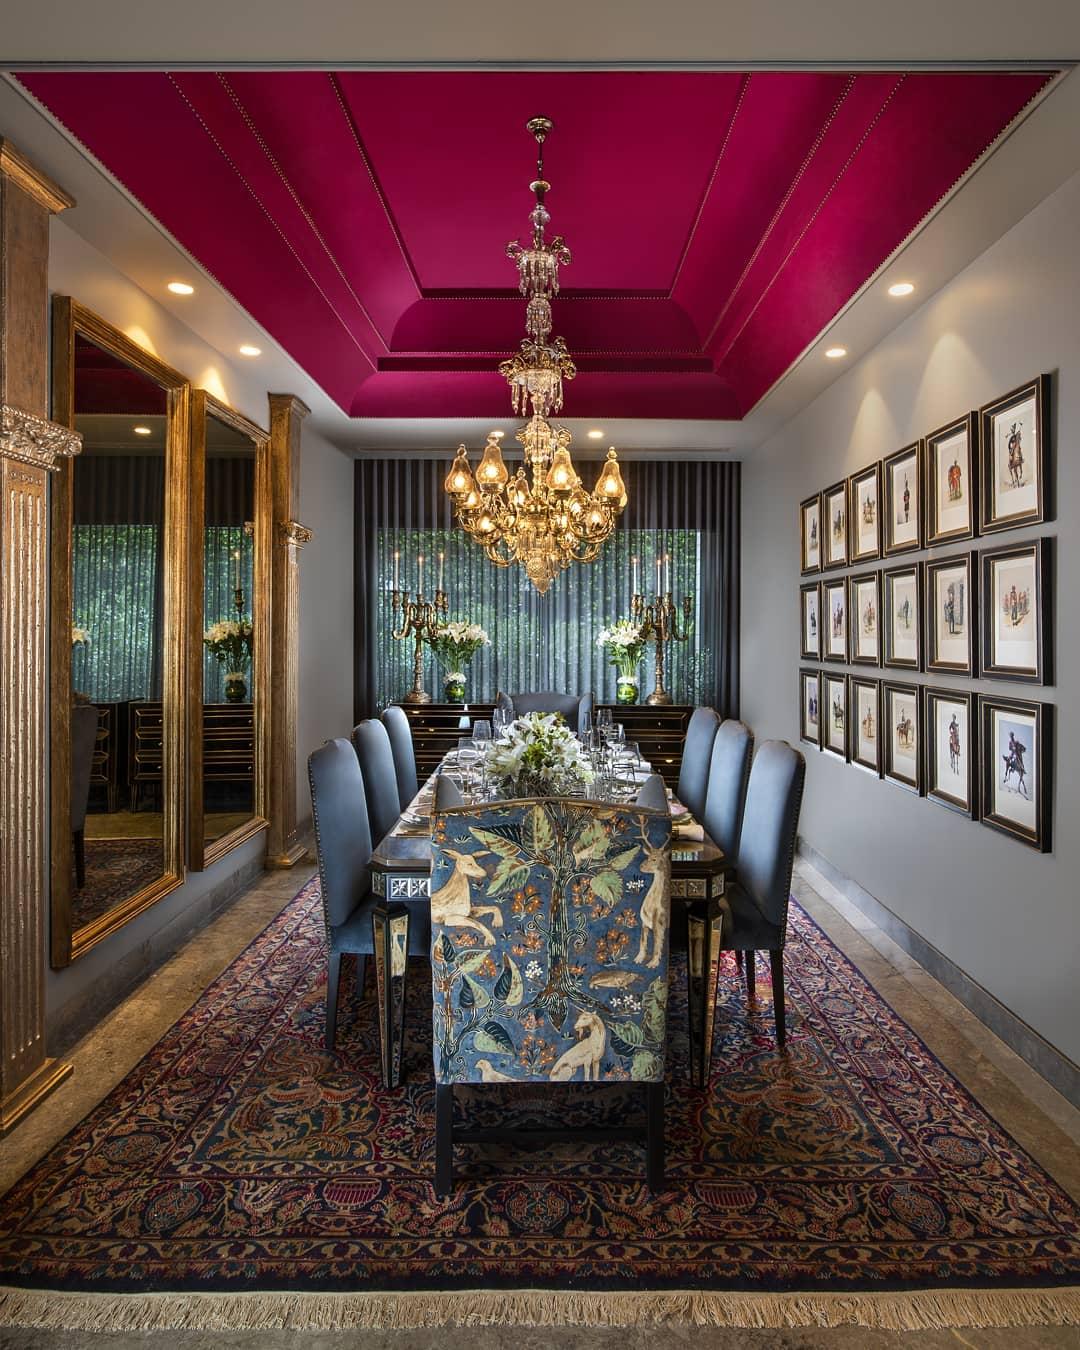 Home Design Ideas India:  Indian Home D Cor Ideas That Match Five Distinct